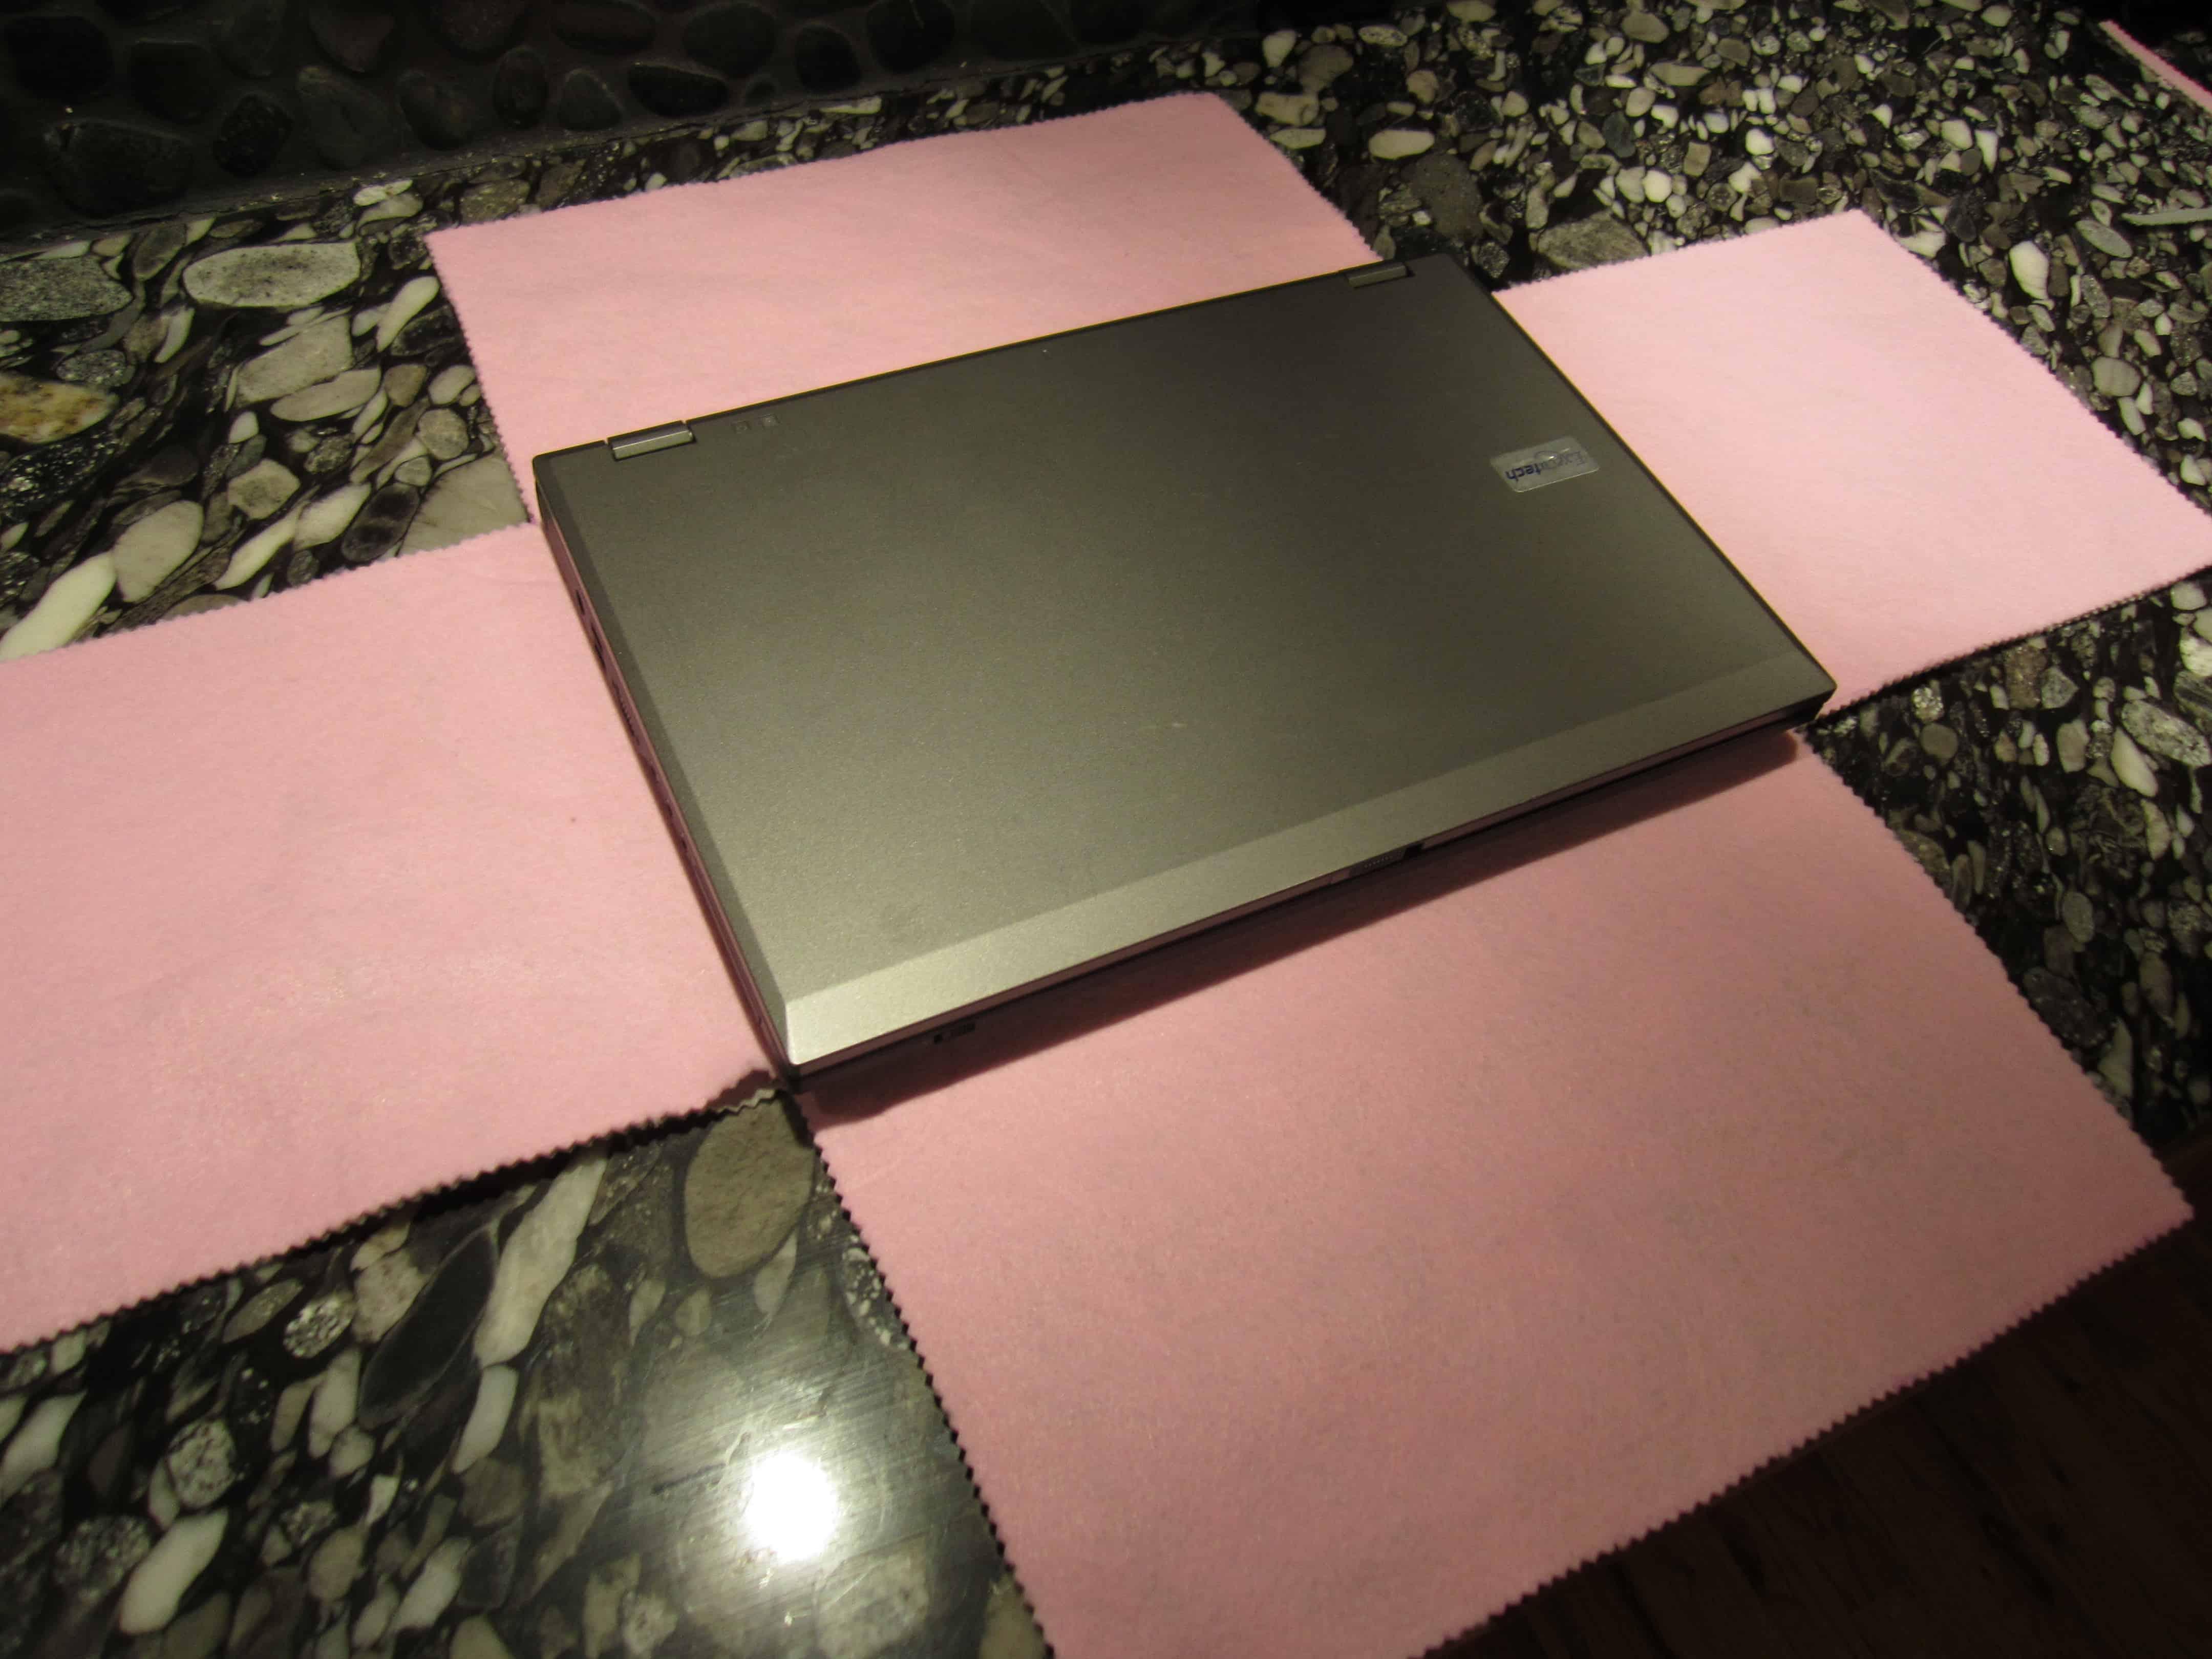 No-sew folding laptop case